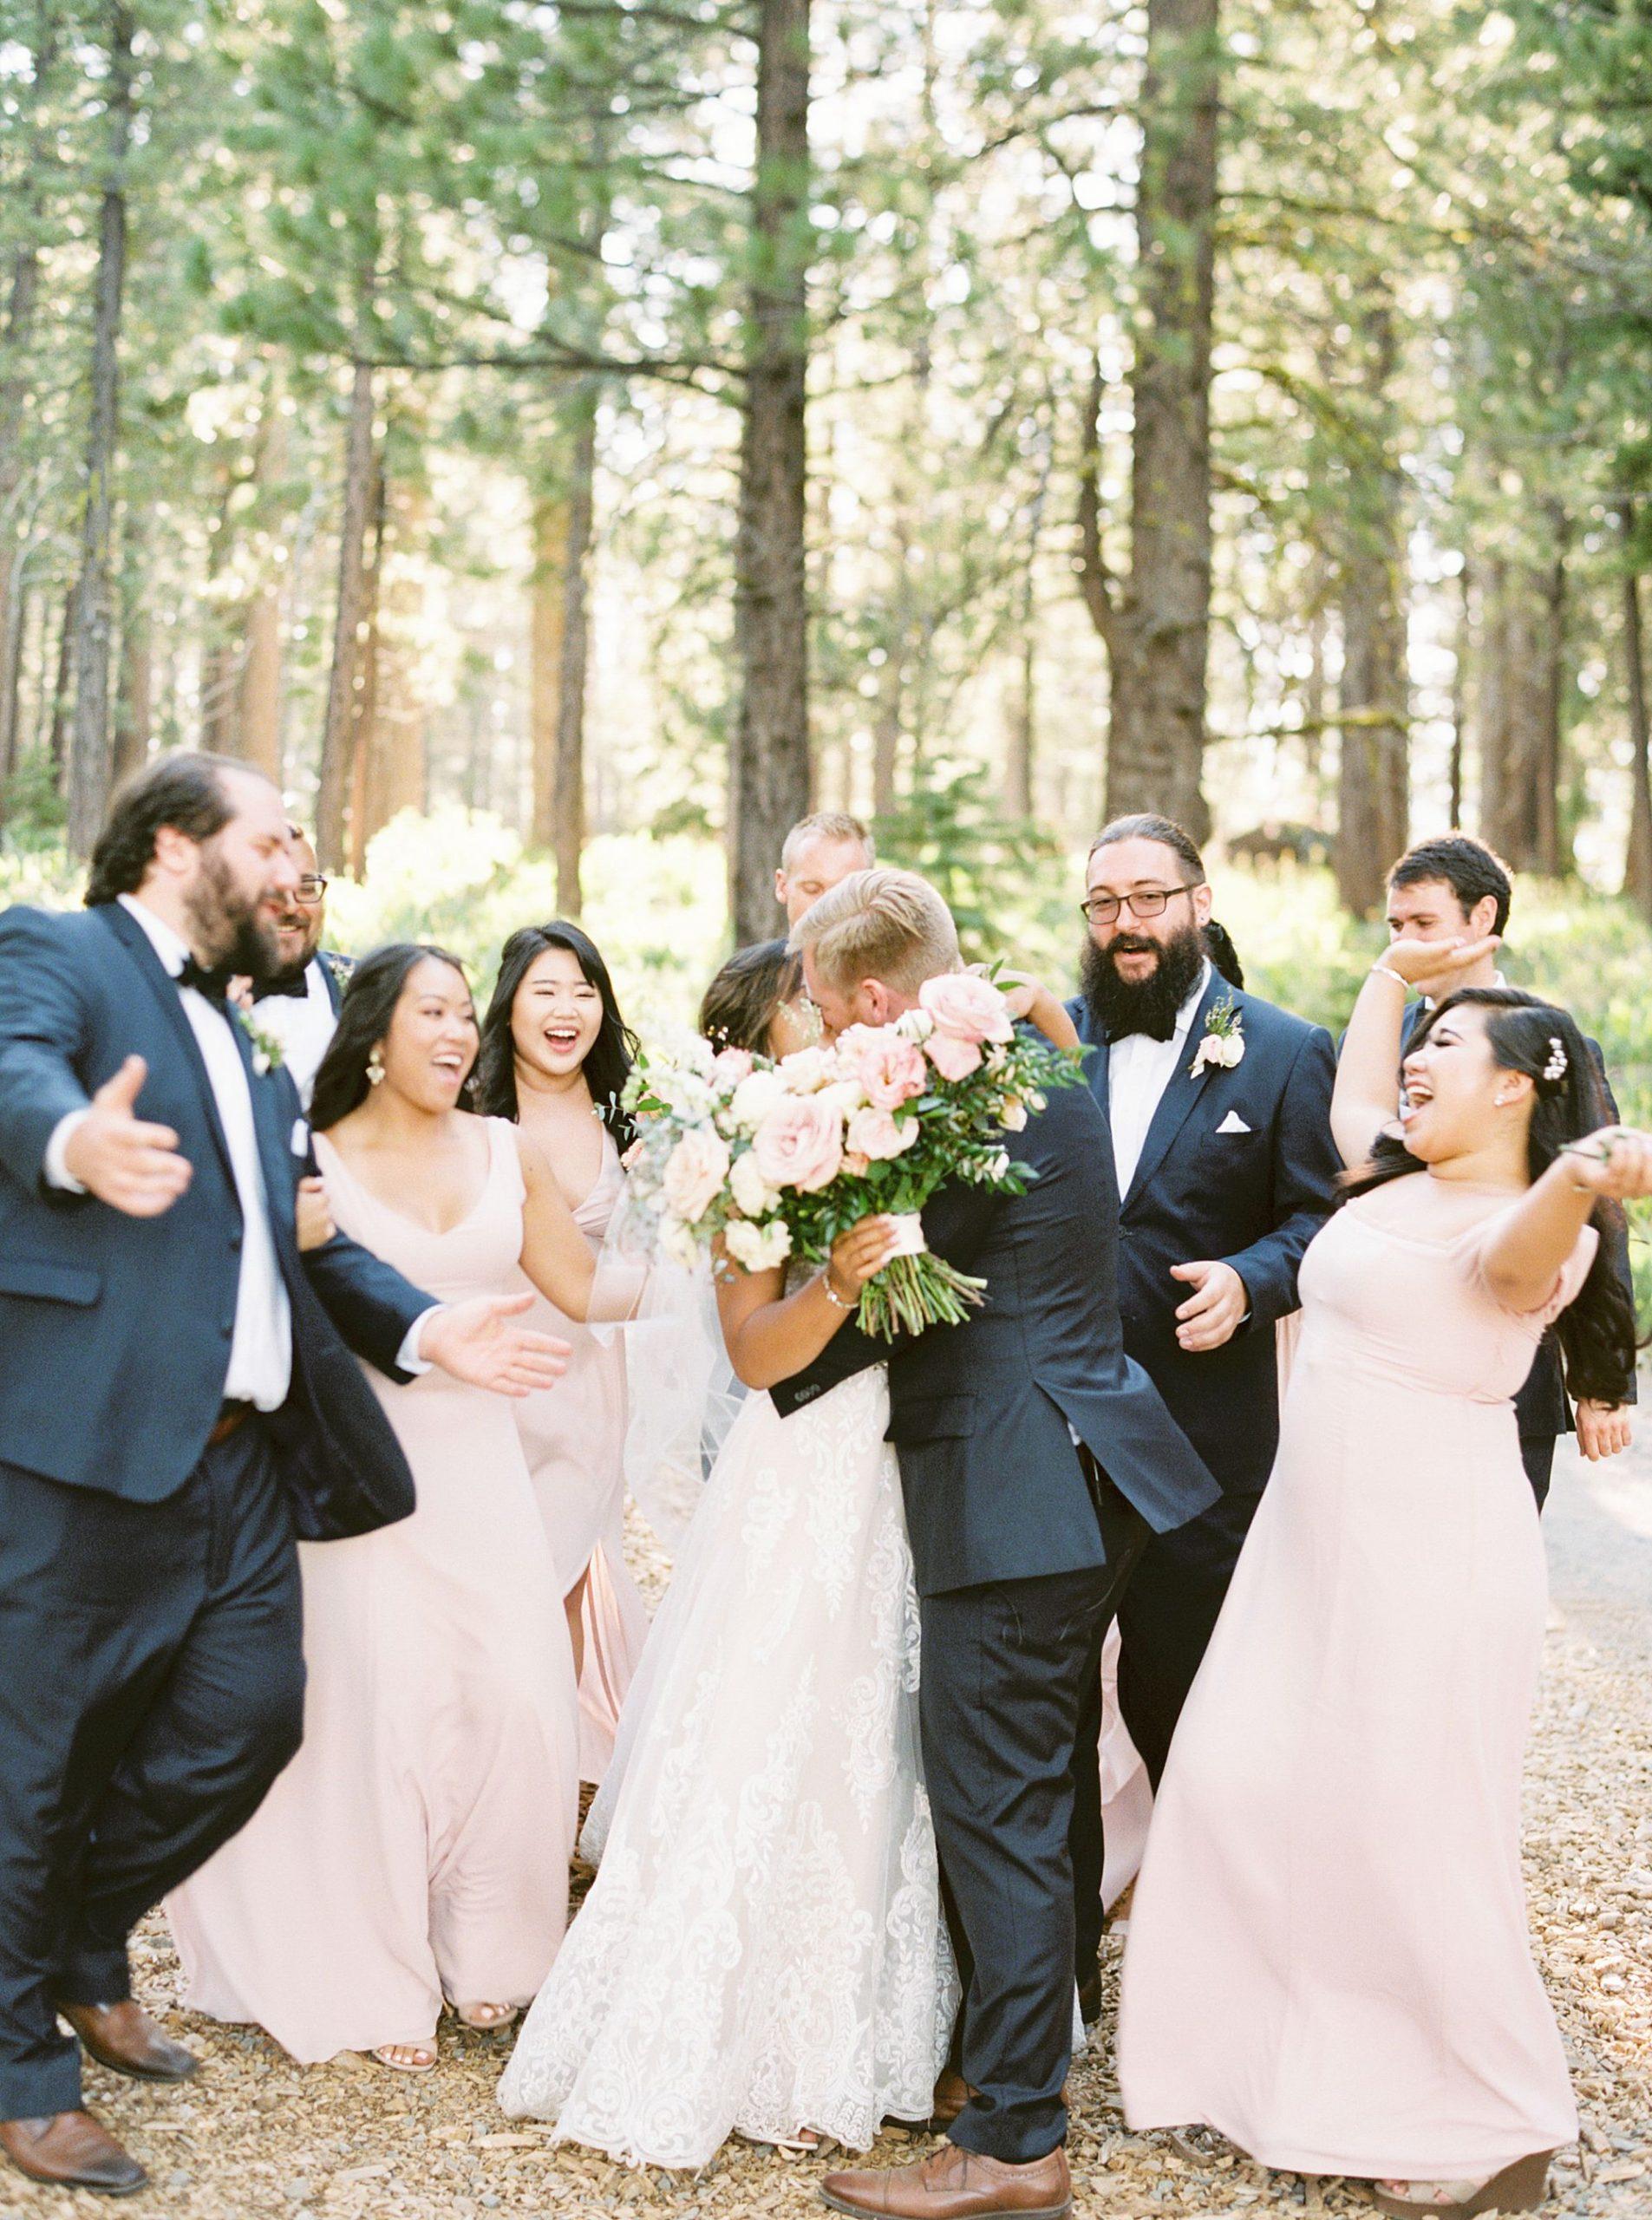 MITCHELLS MOUNTAIN MEADOWS Wedding - Ash Baumgartner - Phallina and Matt - Sierraville Wedding - Tahoe Wedding Photography_0021.jpg